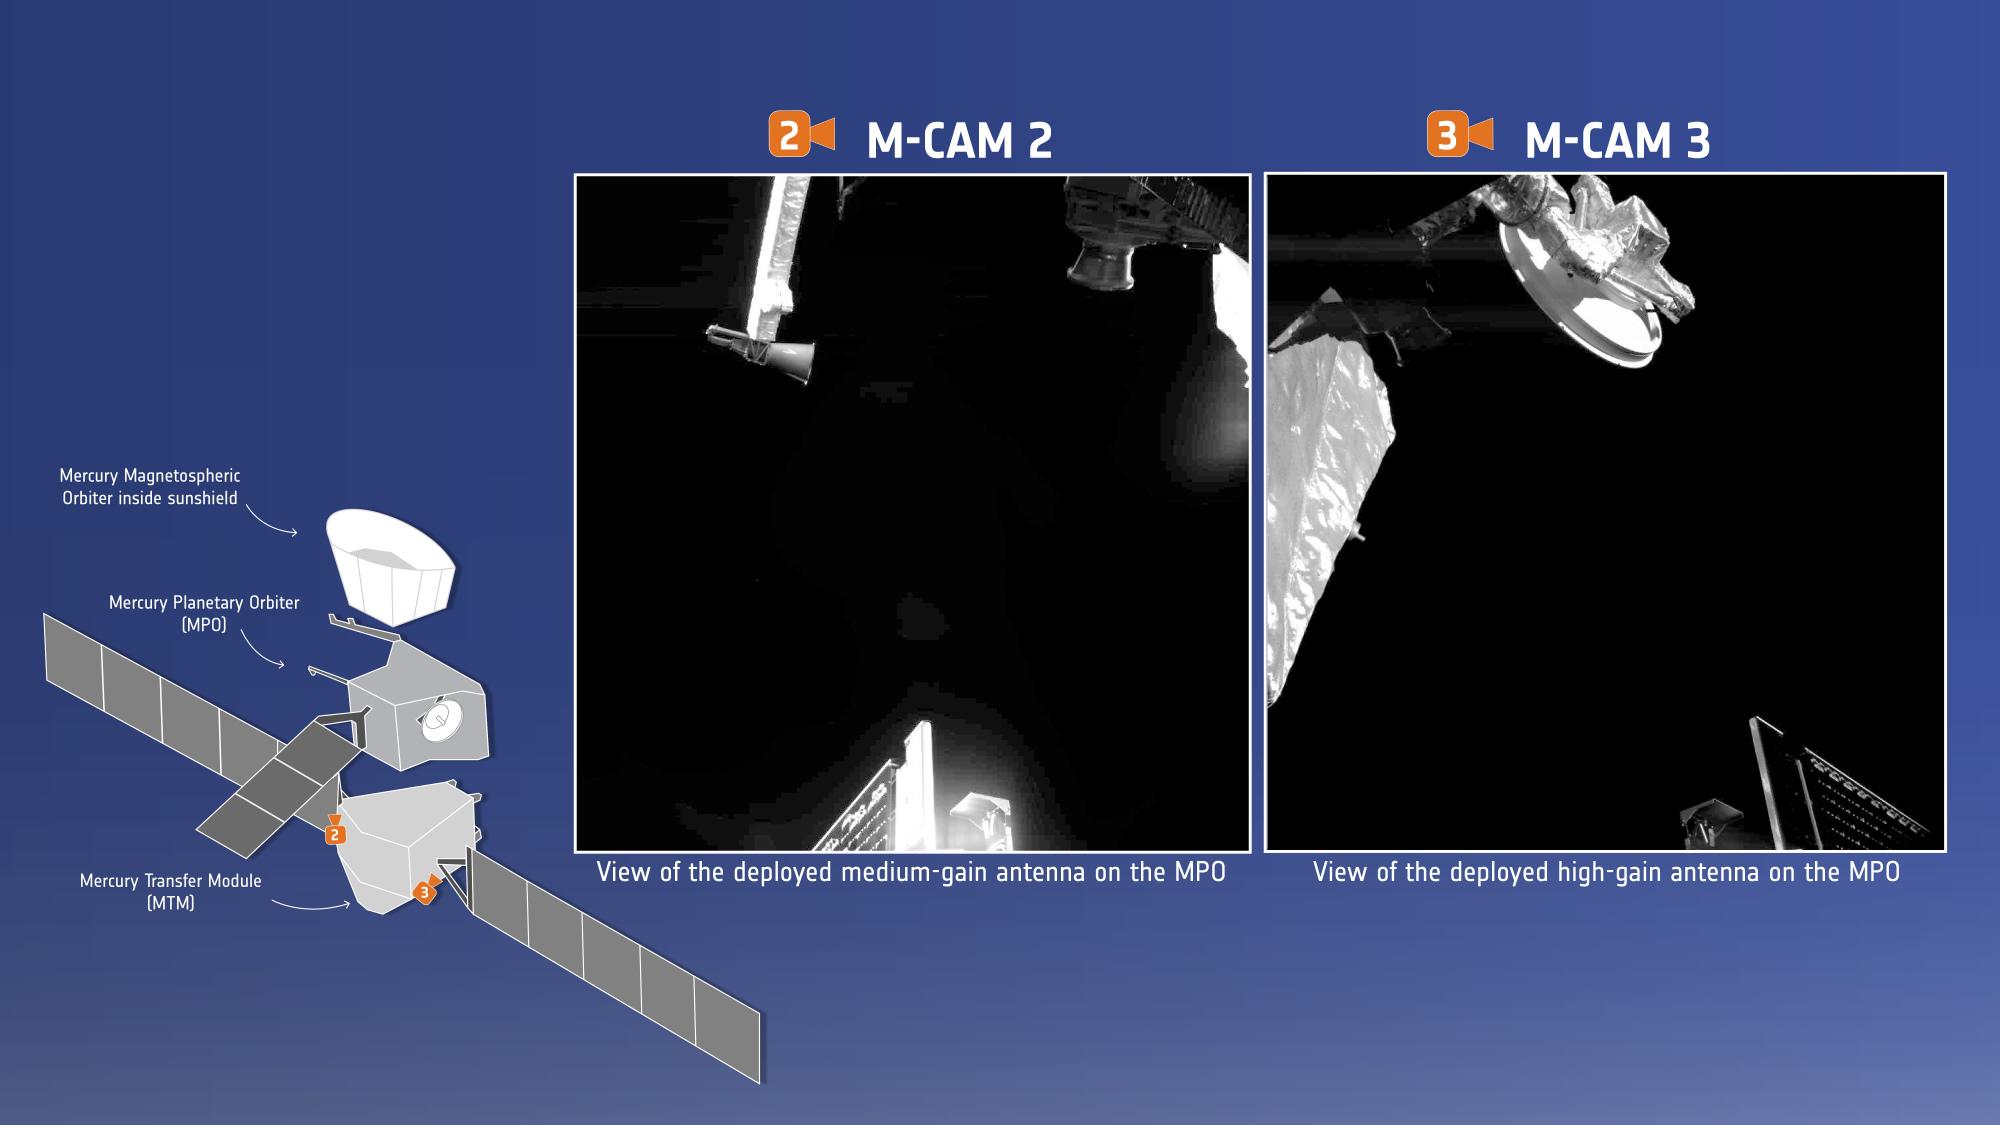 BepiColombo_images_antennas.jpg